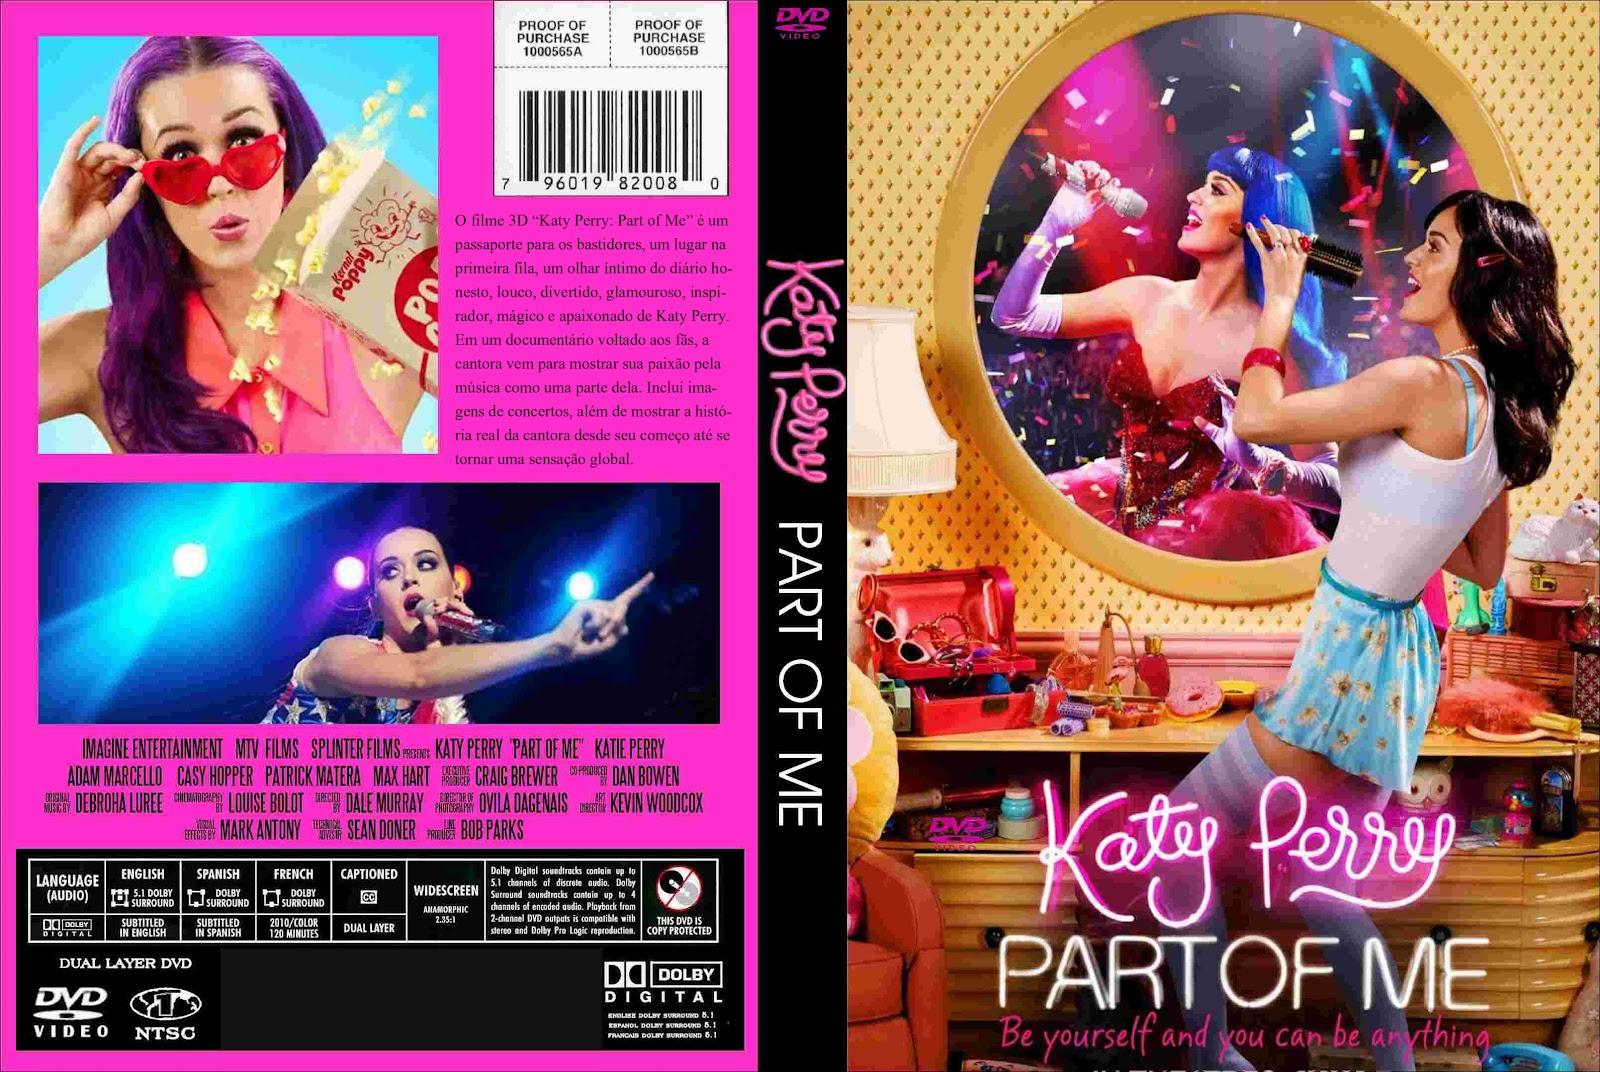 http://2.bp.blogspot.com/-INNhdXu-8YU/UF0aJ-ybPLI/AAAAAAAABsw/Y9RdjWy2ECo/s1600/Katy+Perry+Part+of+Me.jpg